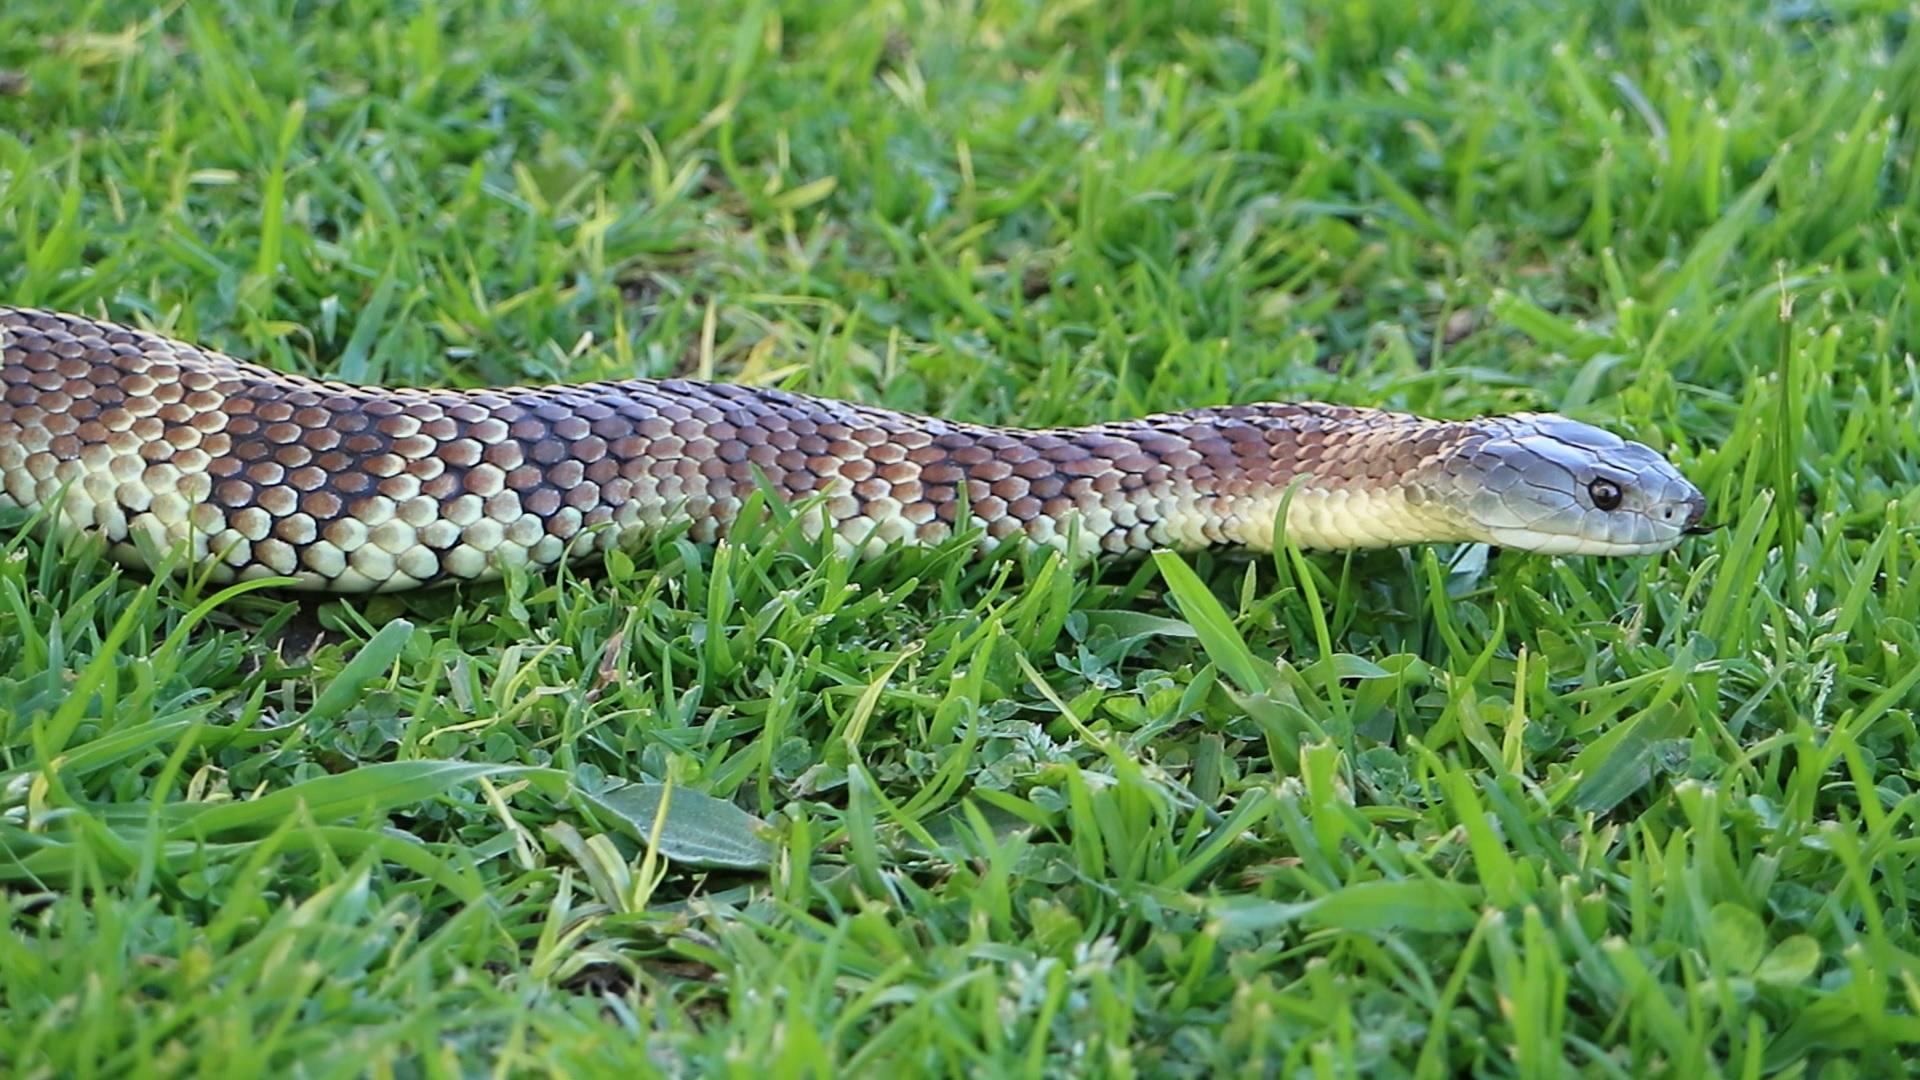 Eastern Tiger Snake on grass